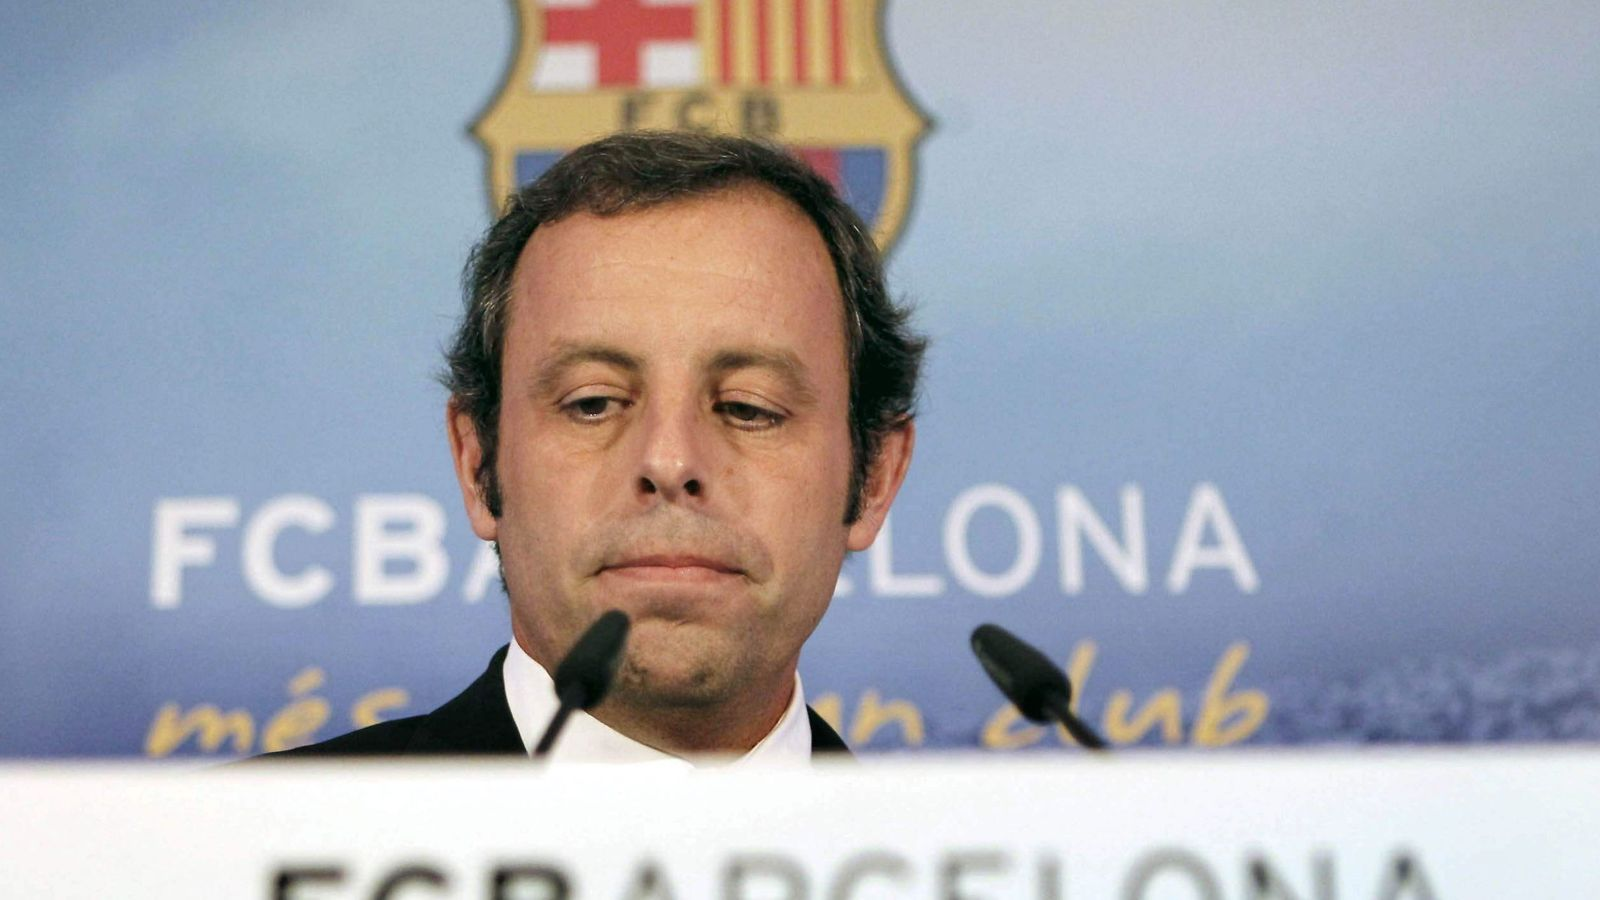 Foto: El expresidente del FC Barcelona Sandro Rosell. (EFE)